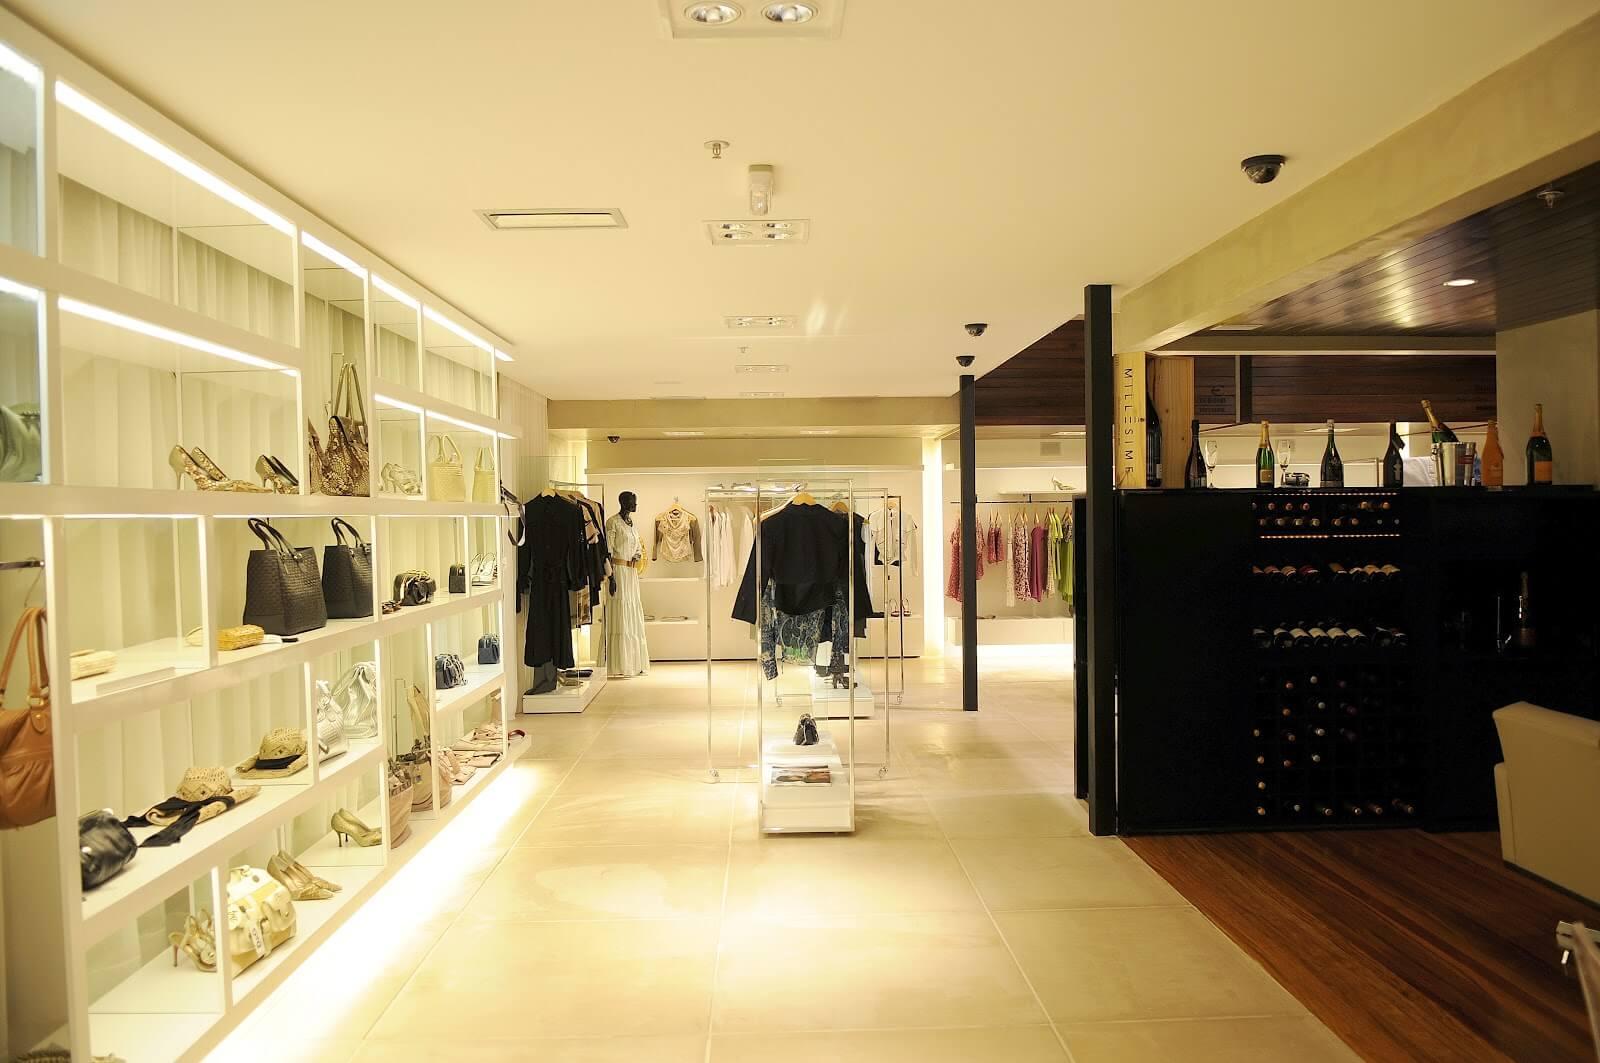 Despacho-de-Arquitectos-Grupo-Pi-Victtus-Proyectos-Retail-11